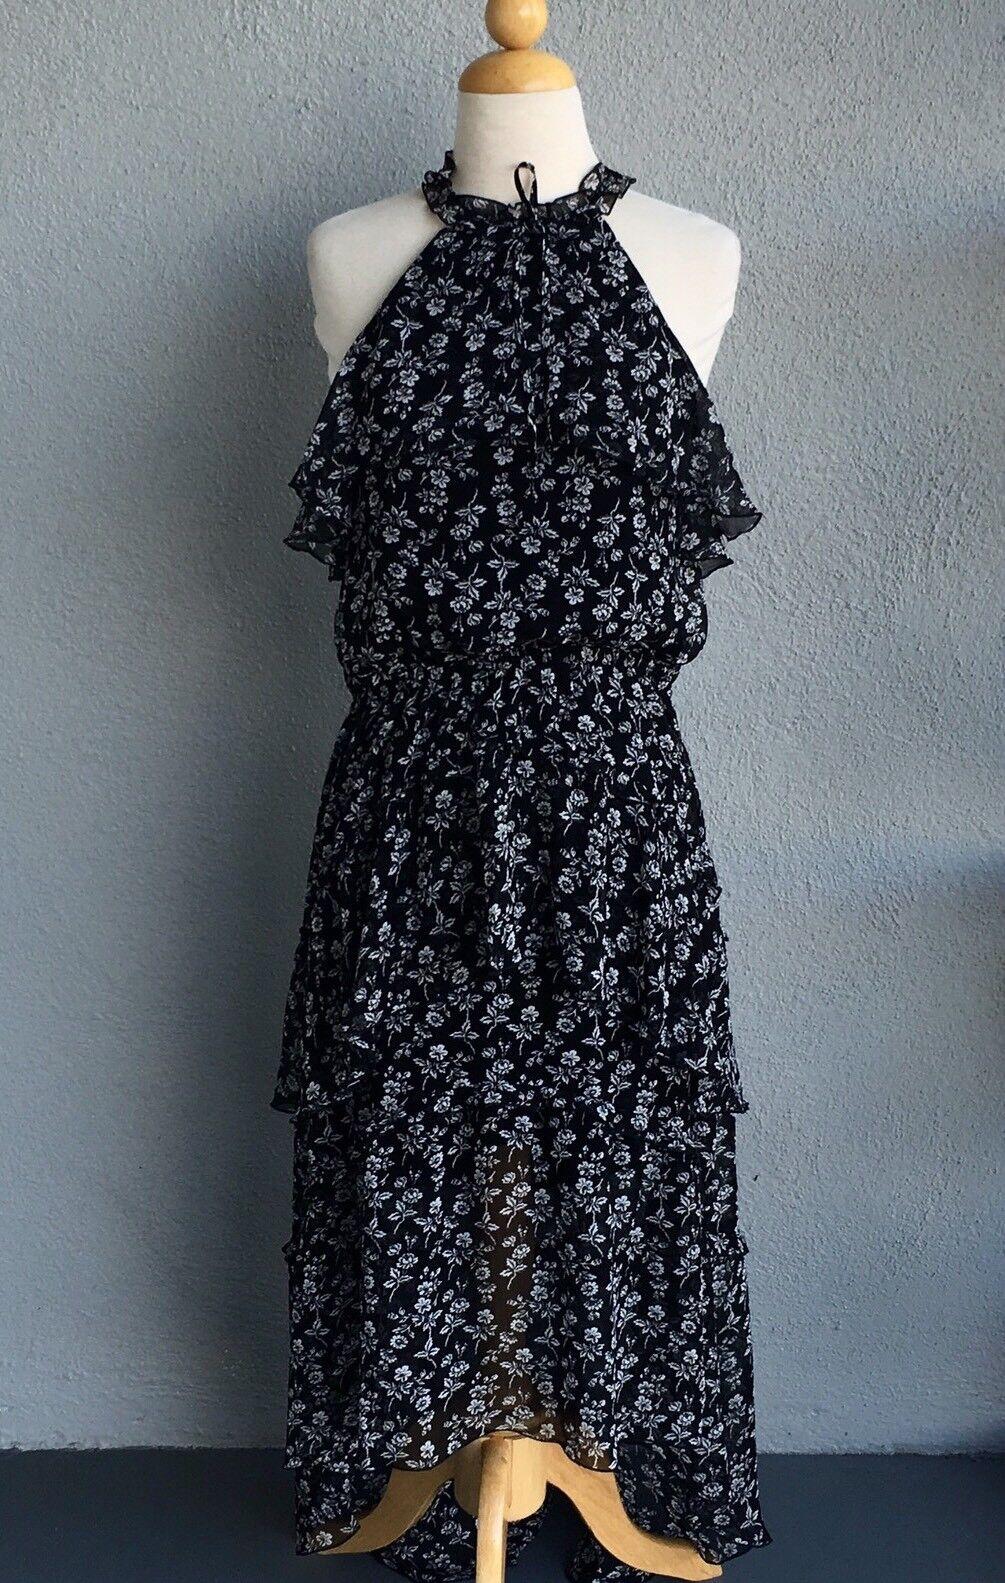 EXPRESS Floral Ruffle Dress Size L. NWT. Retail  79